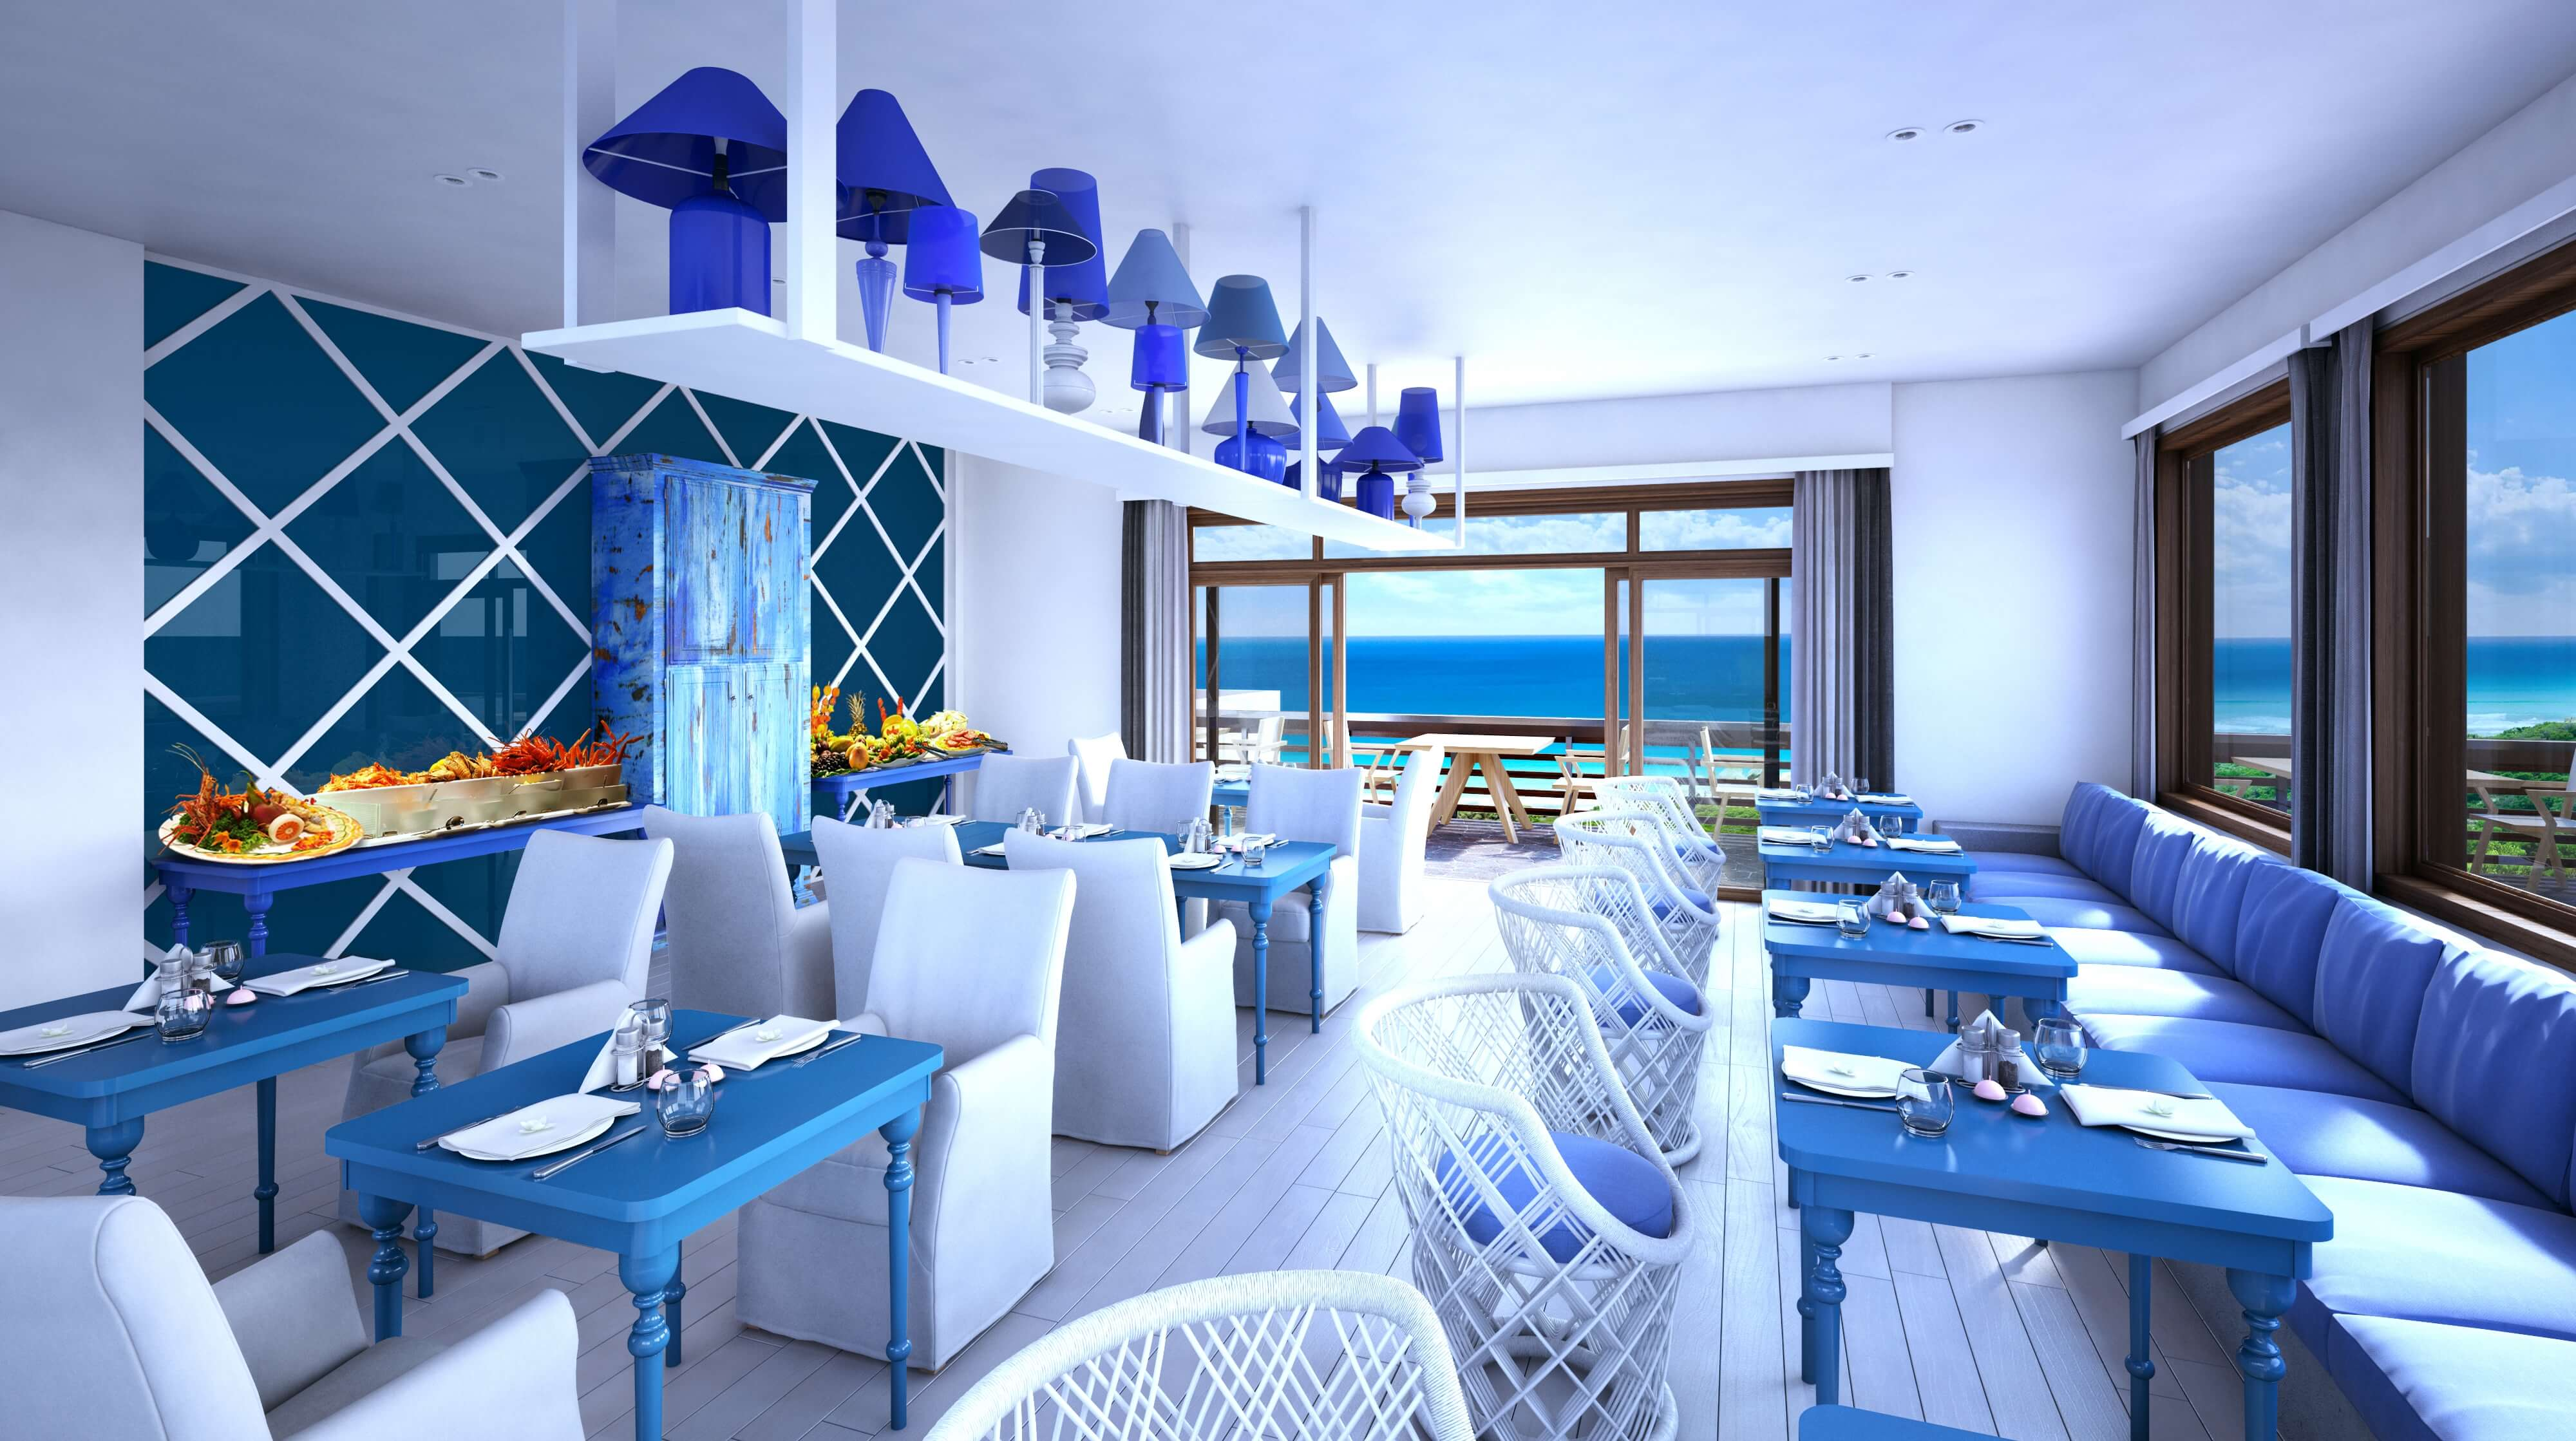 Mozambique - Hotel Diamonds Mequfi Beach Resort